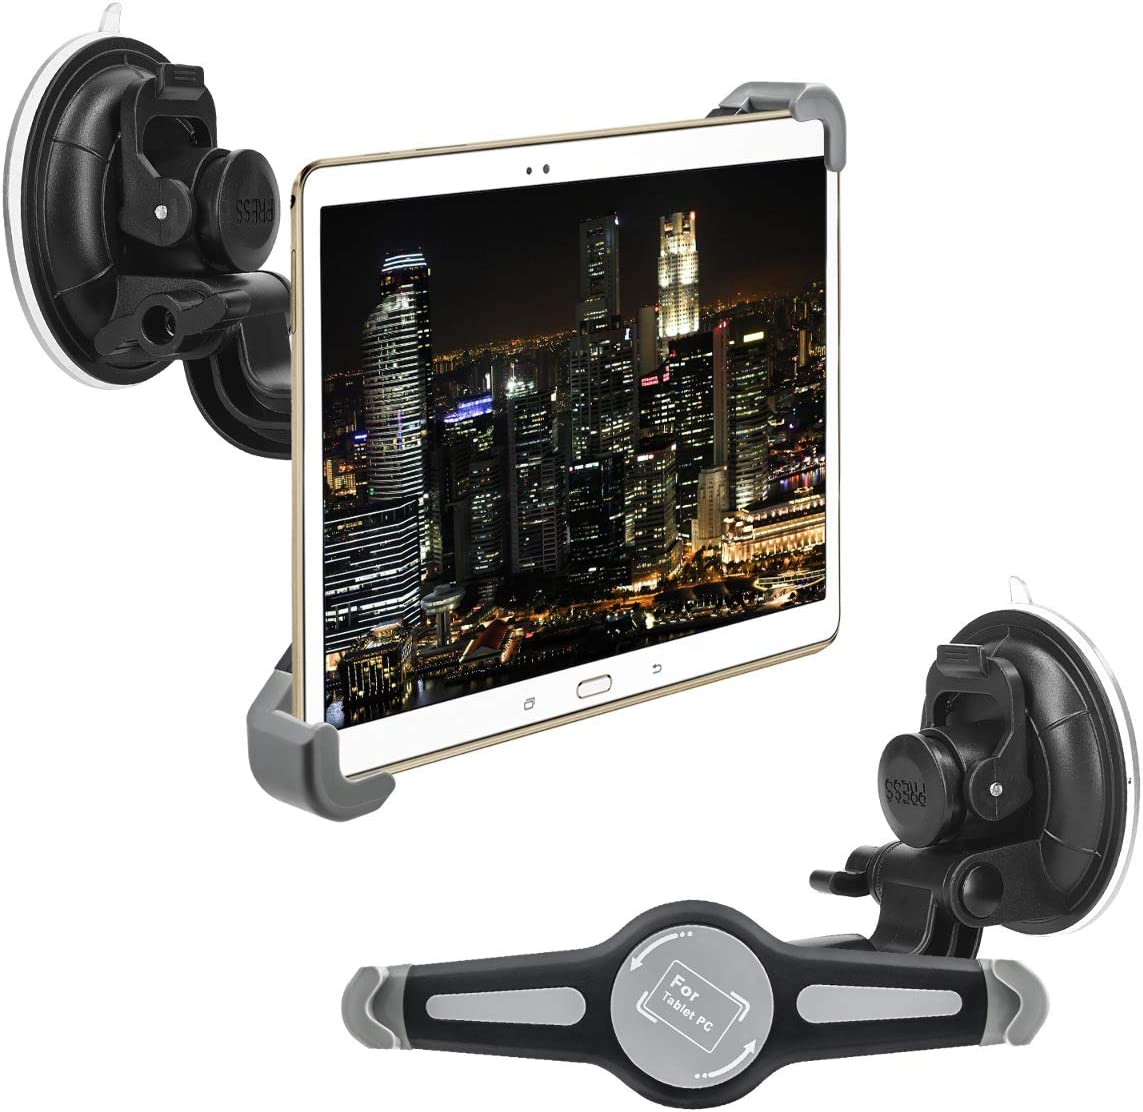 Kwmobile 10 Tablet Pc Kfz Scheiben Halterung Pkw Elektronik